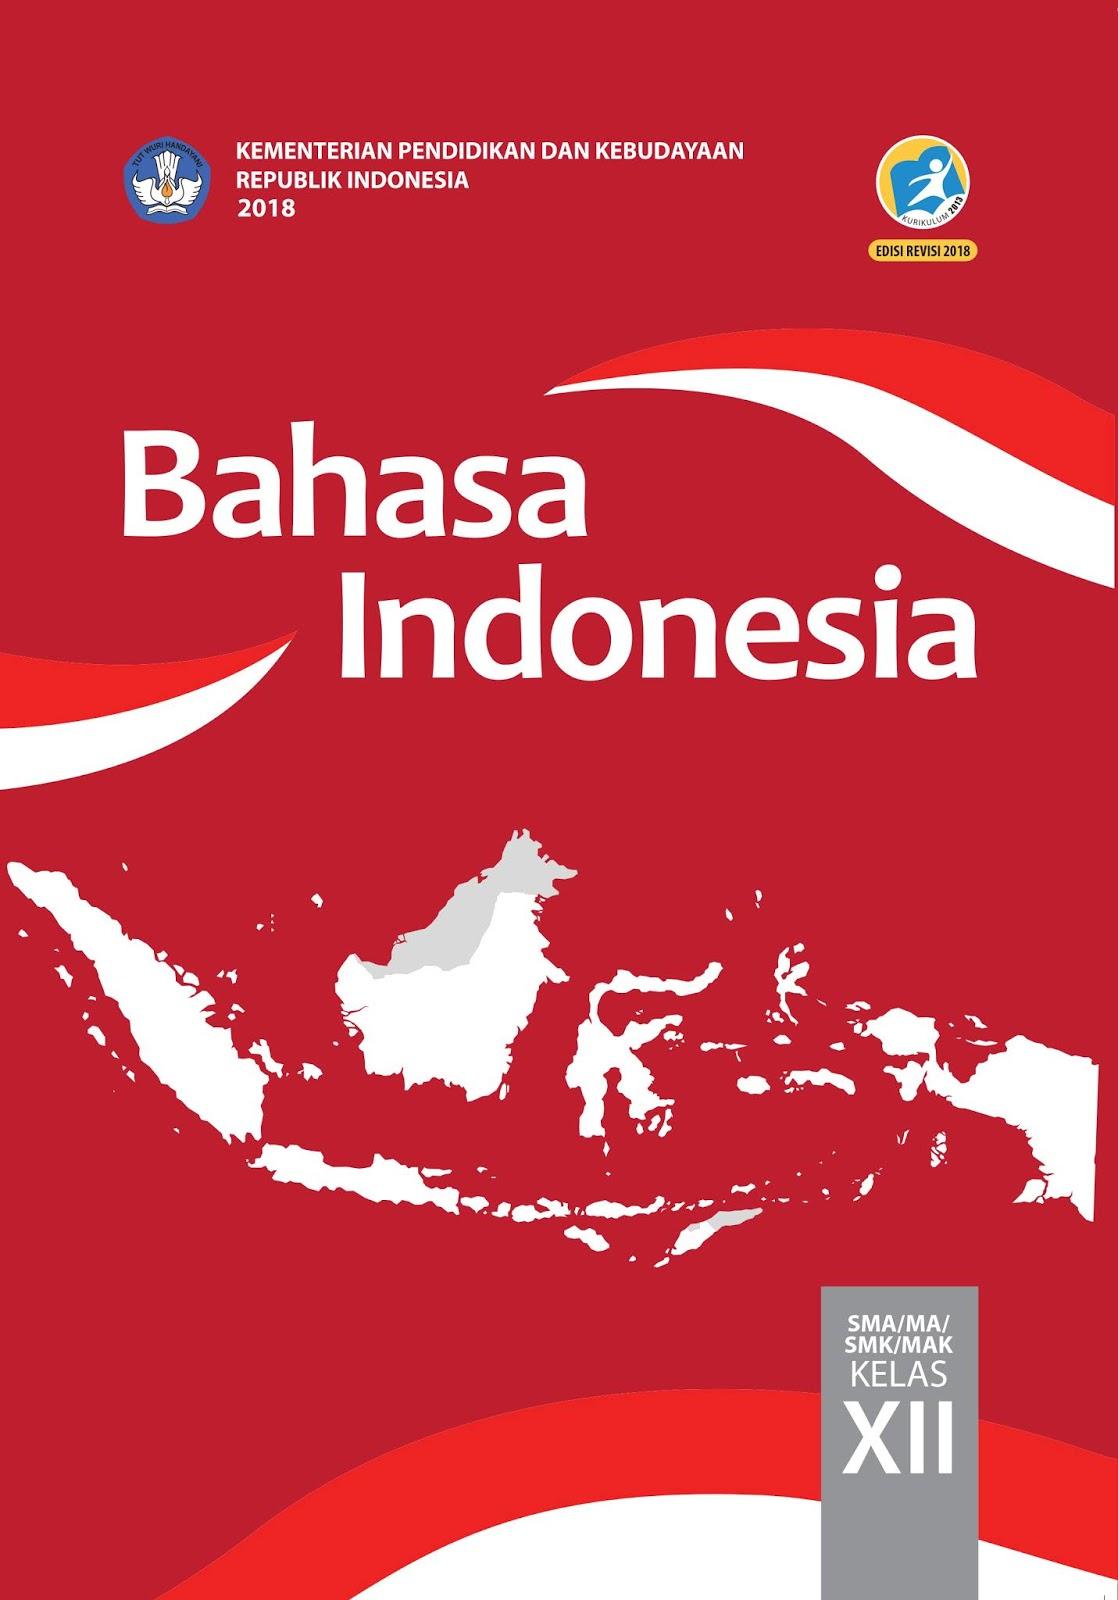 Contoh Rpp Bahasa Indonesia Kelas Xii Kurikulum